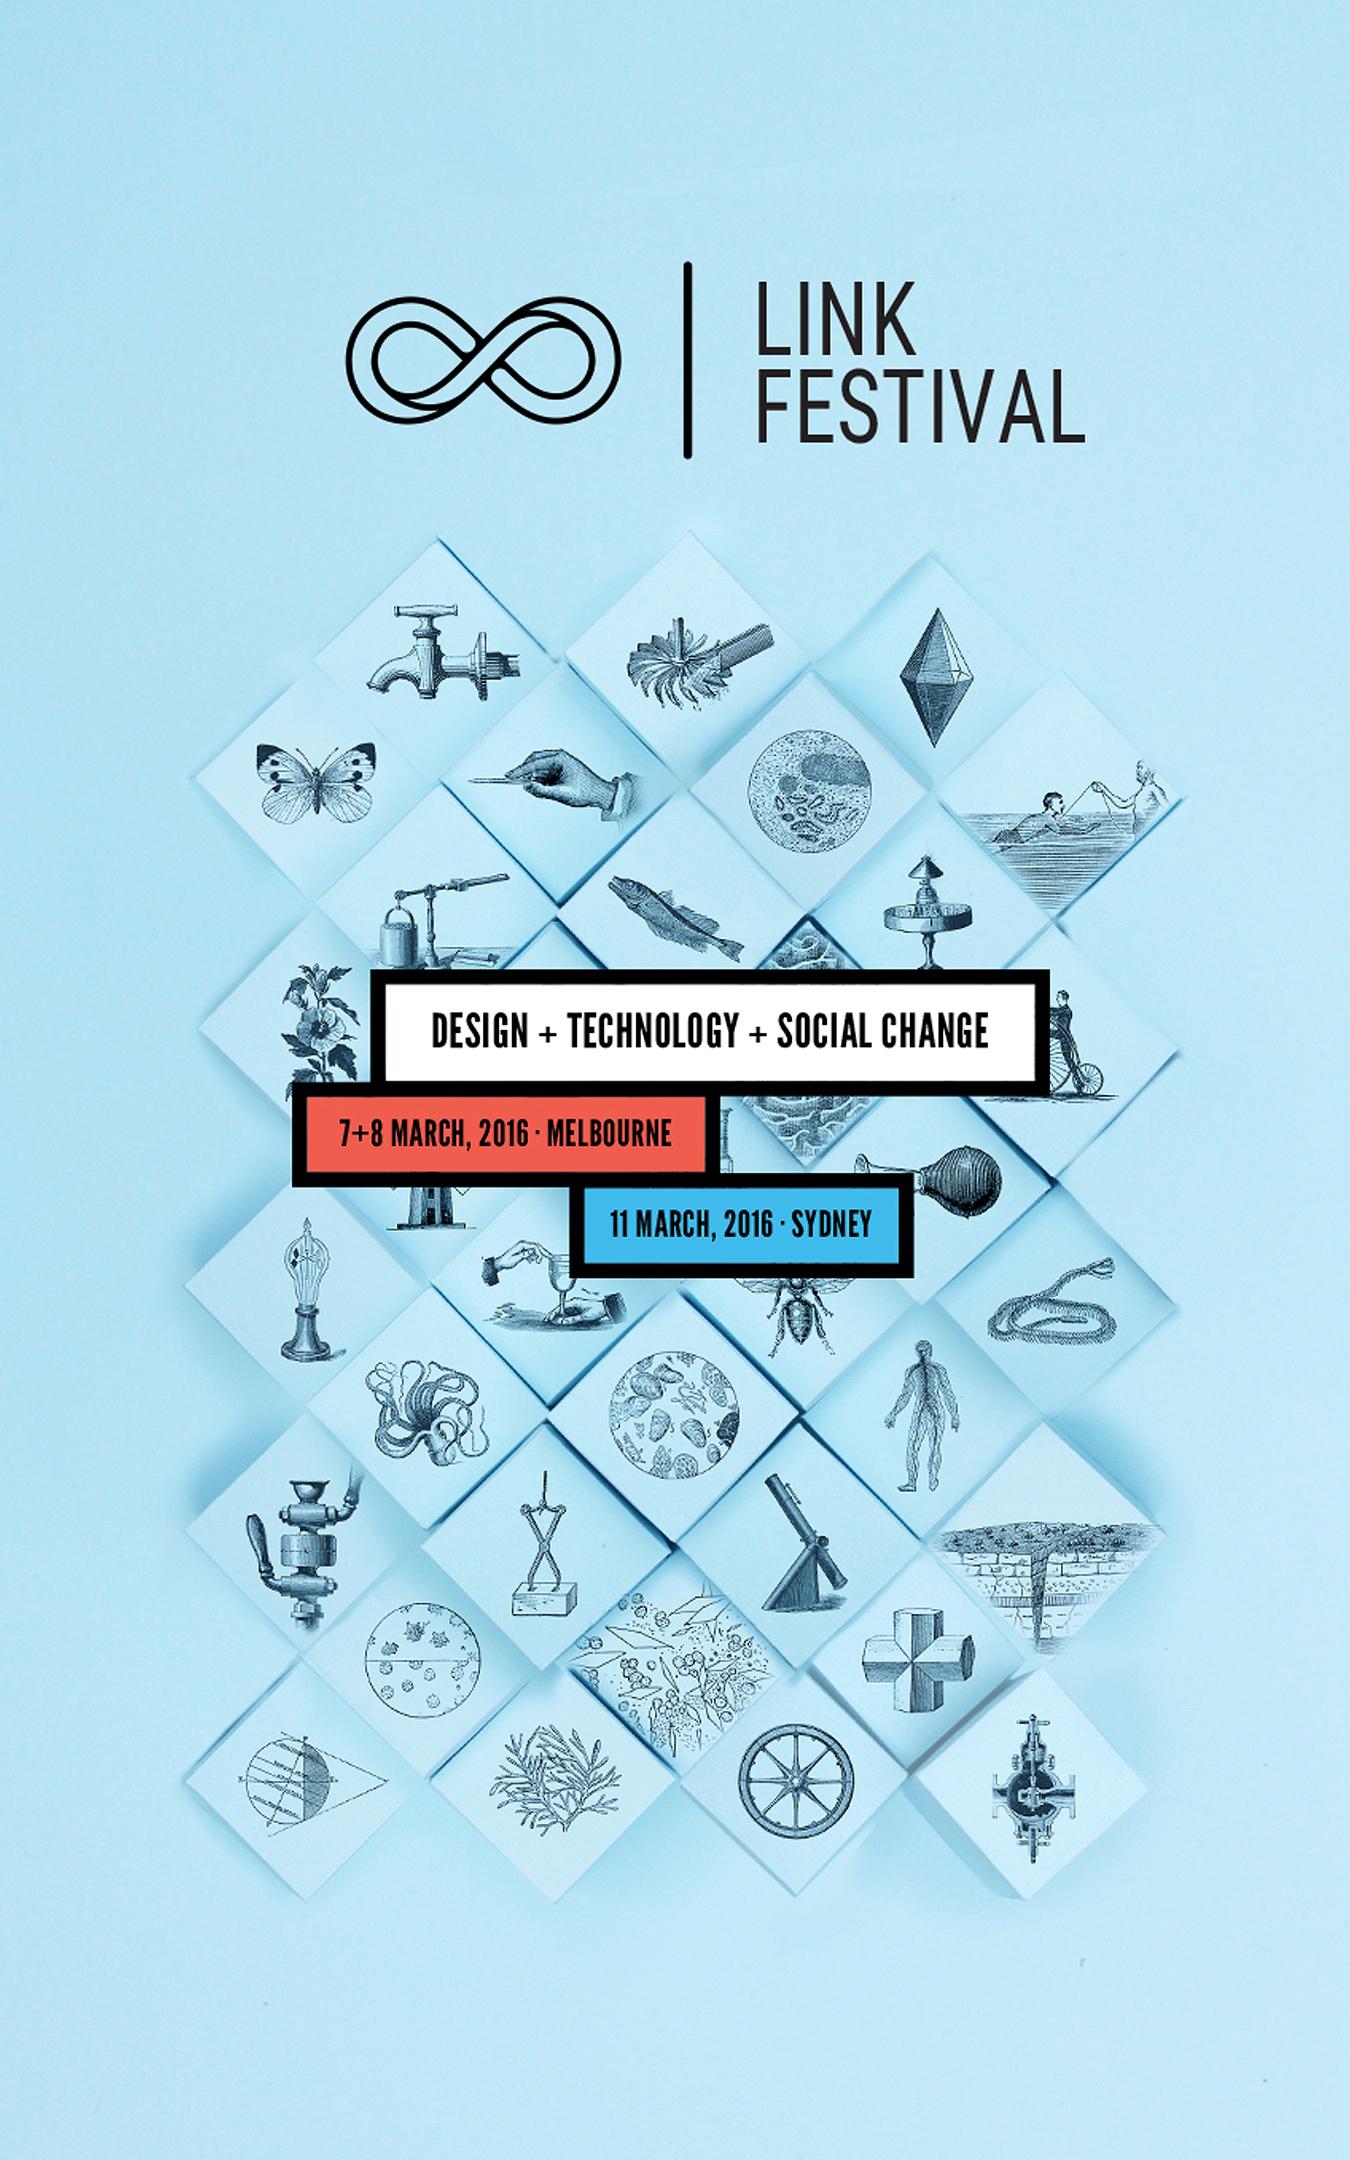 link-festival-concept.jpeg